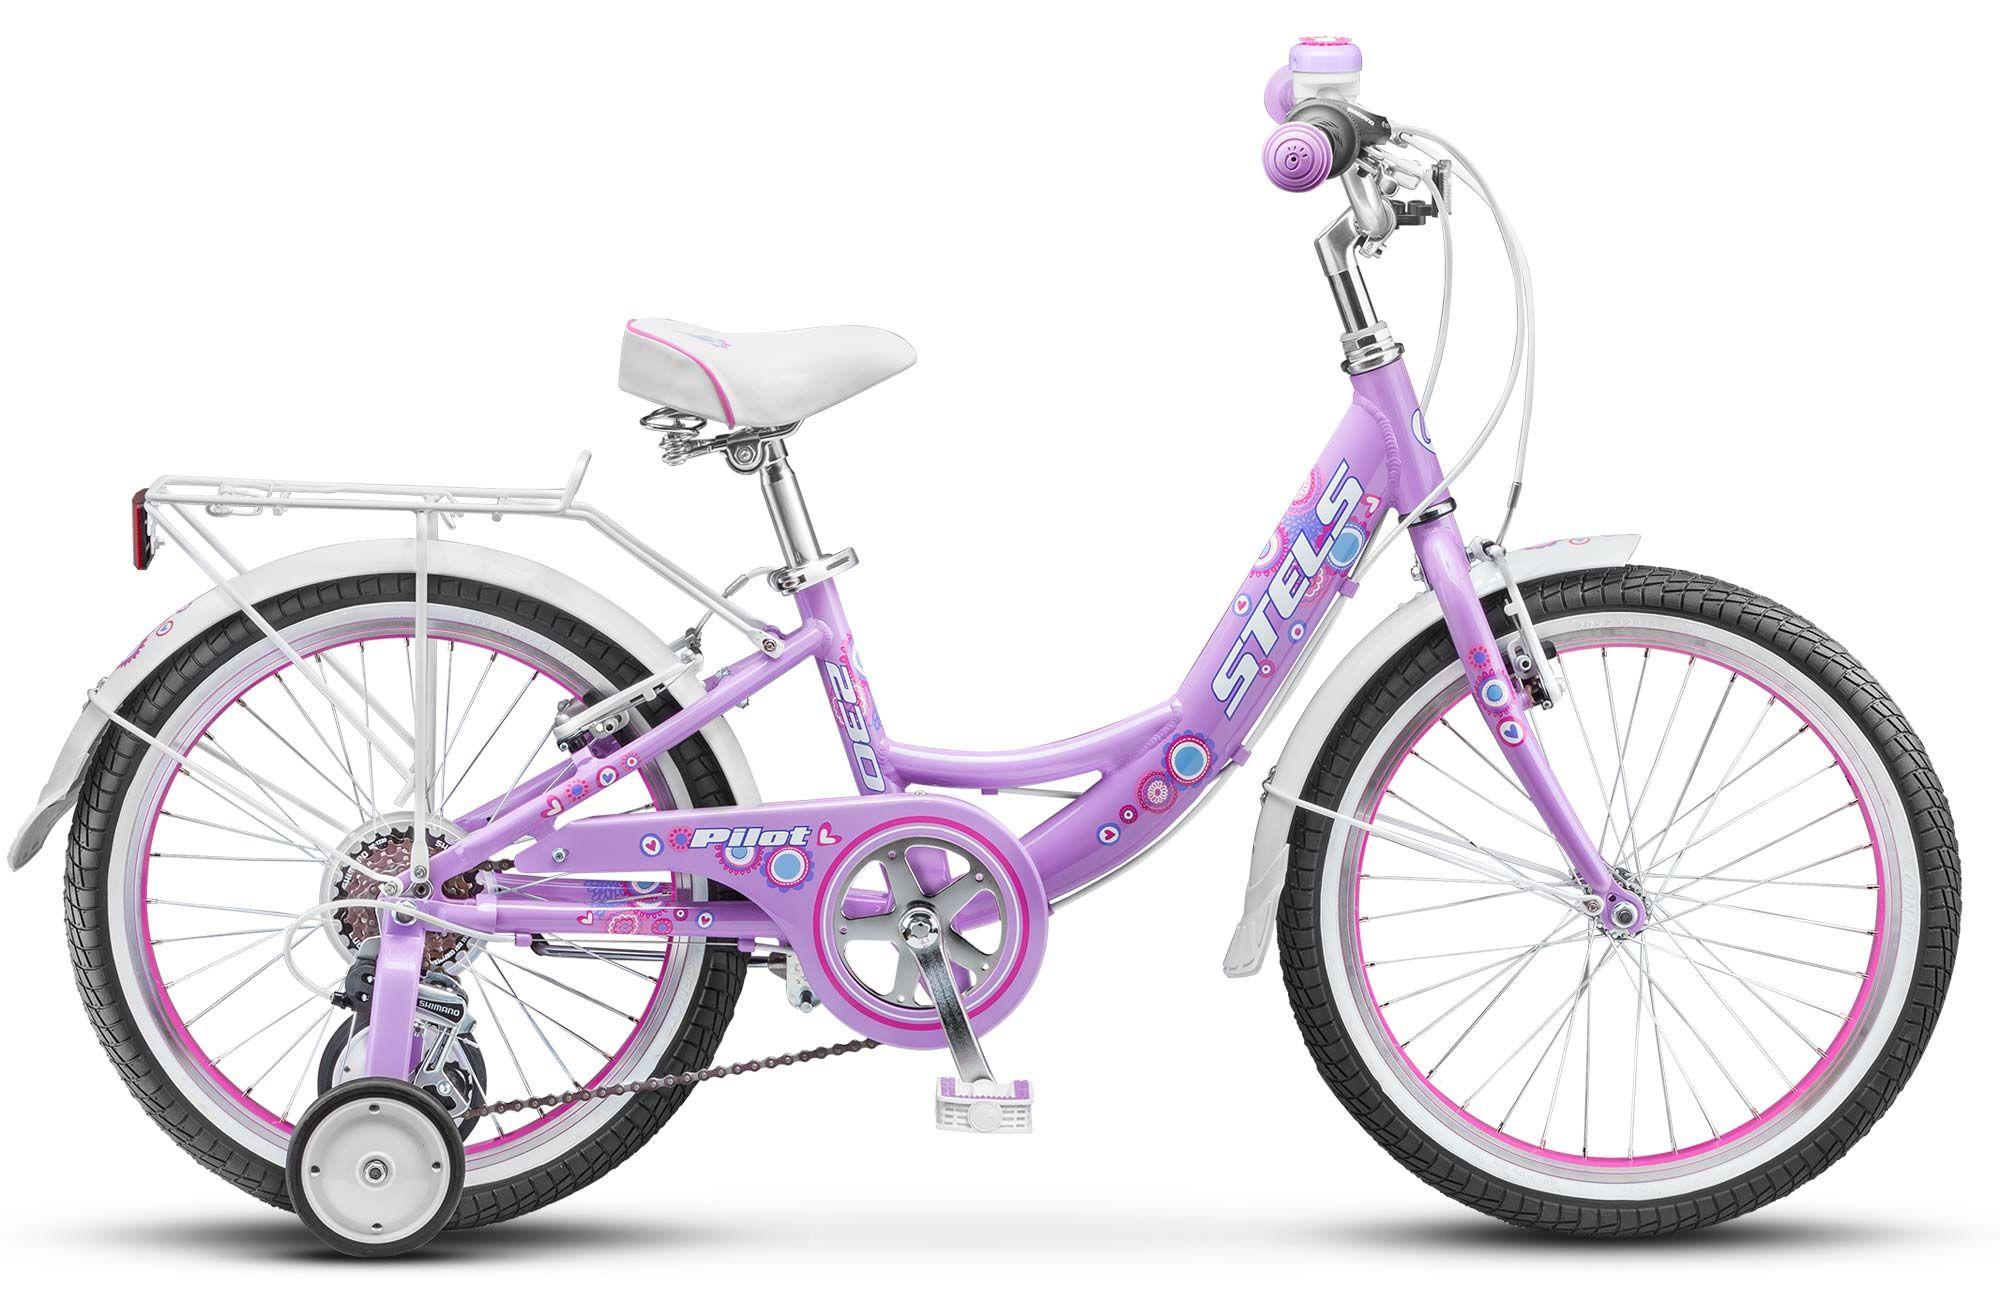 Велосипед Stels Pilot 230 Girl 2016 велосипед stels pilot 240 girl 3sp 2016